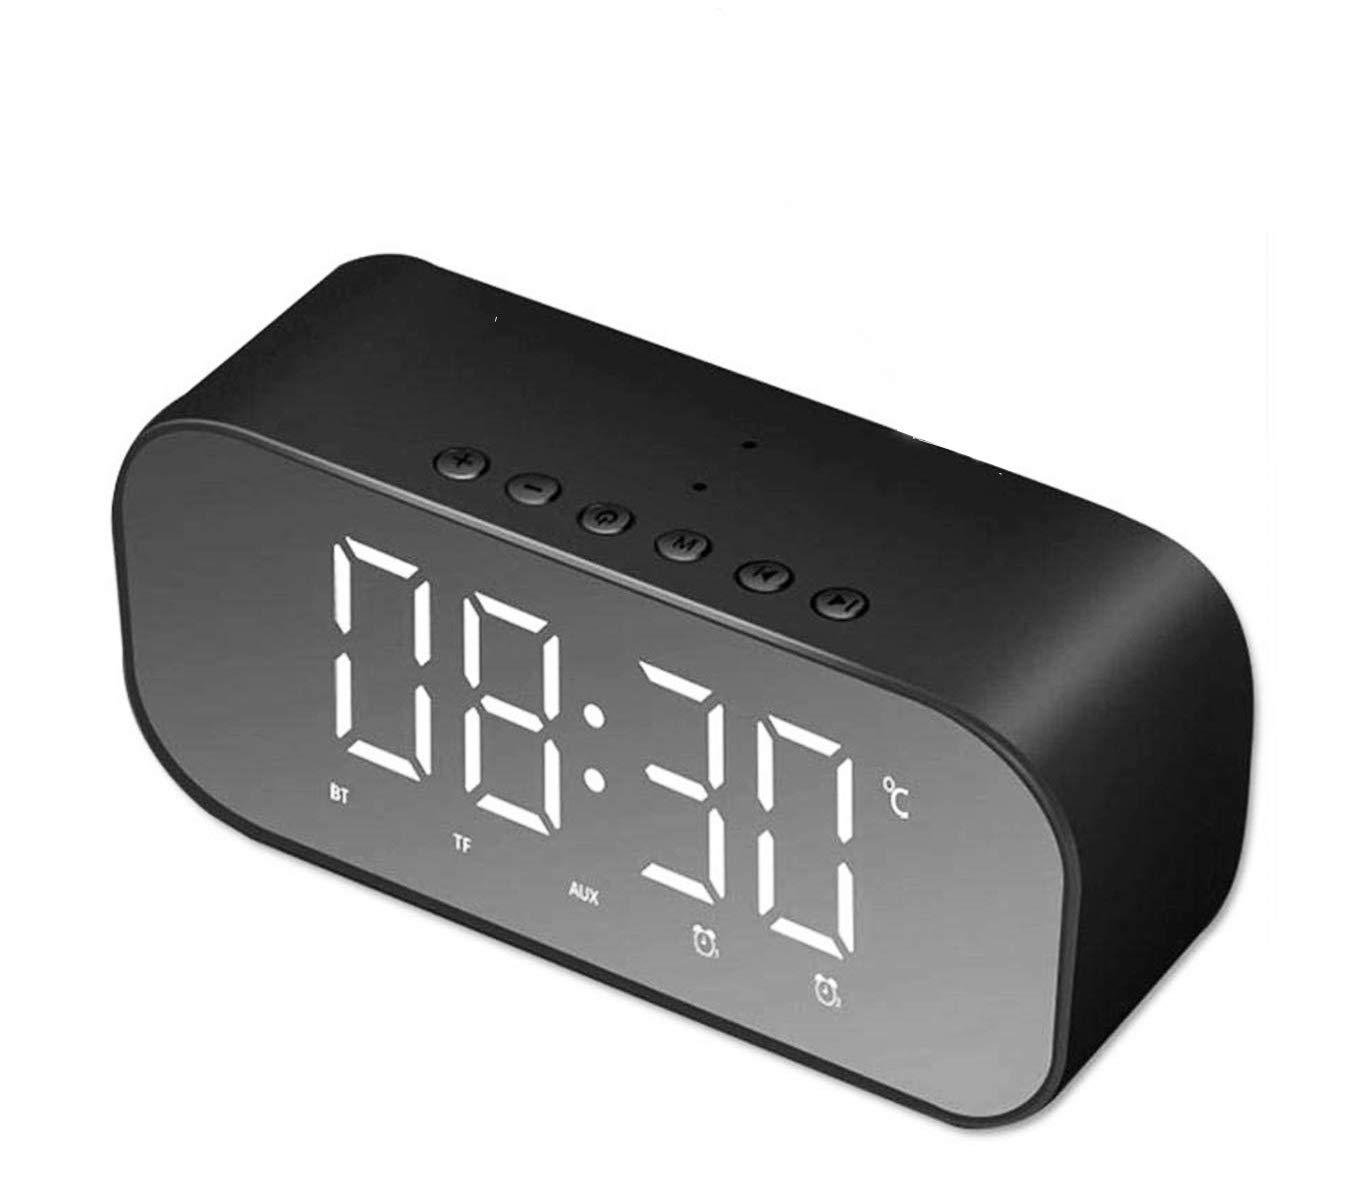 Clavier Portable Bluetooth Speaker, Bluetooth 5.0 Wireless